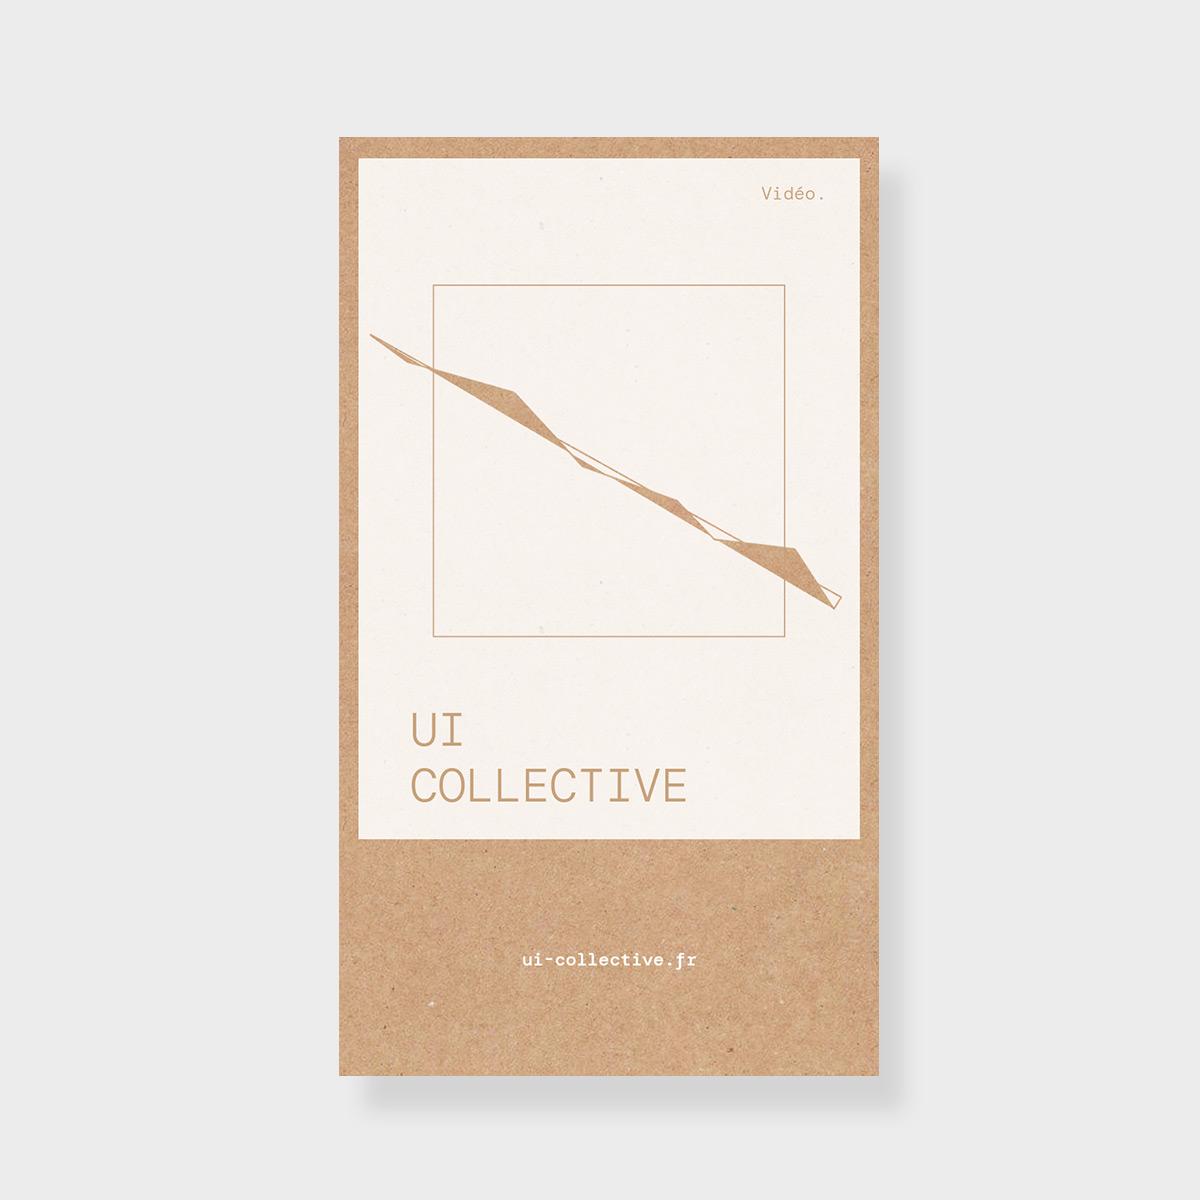 https://isse-ari-design.fr/wp-content/uploads/2020/08/video-ui-collective.jpg